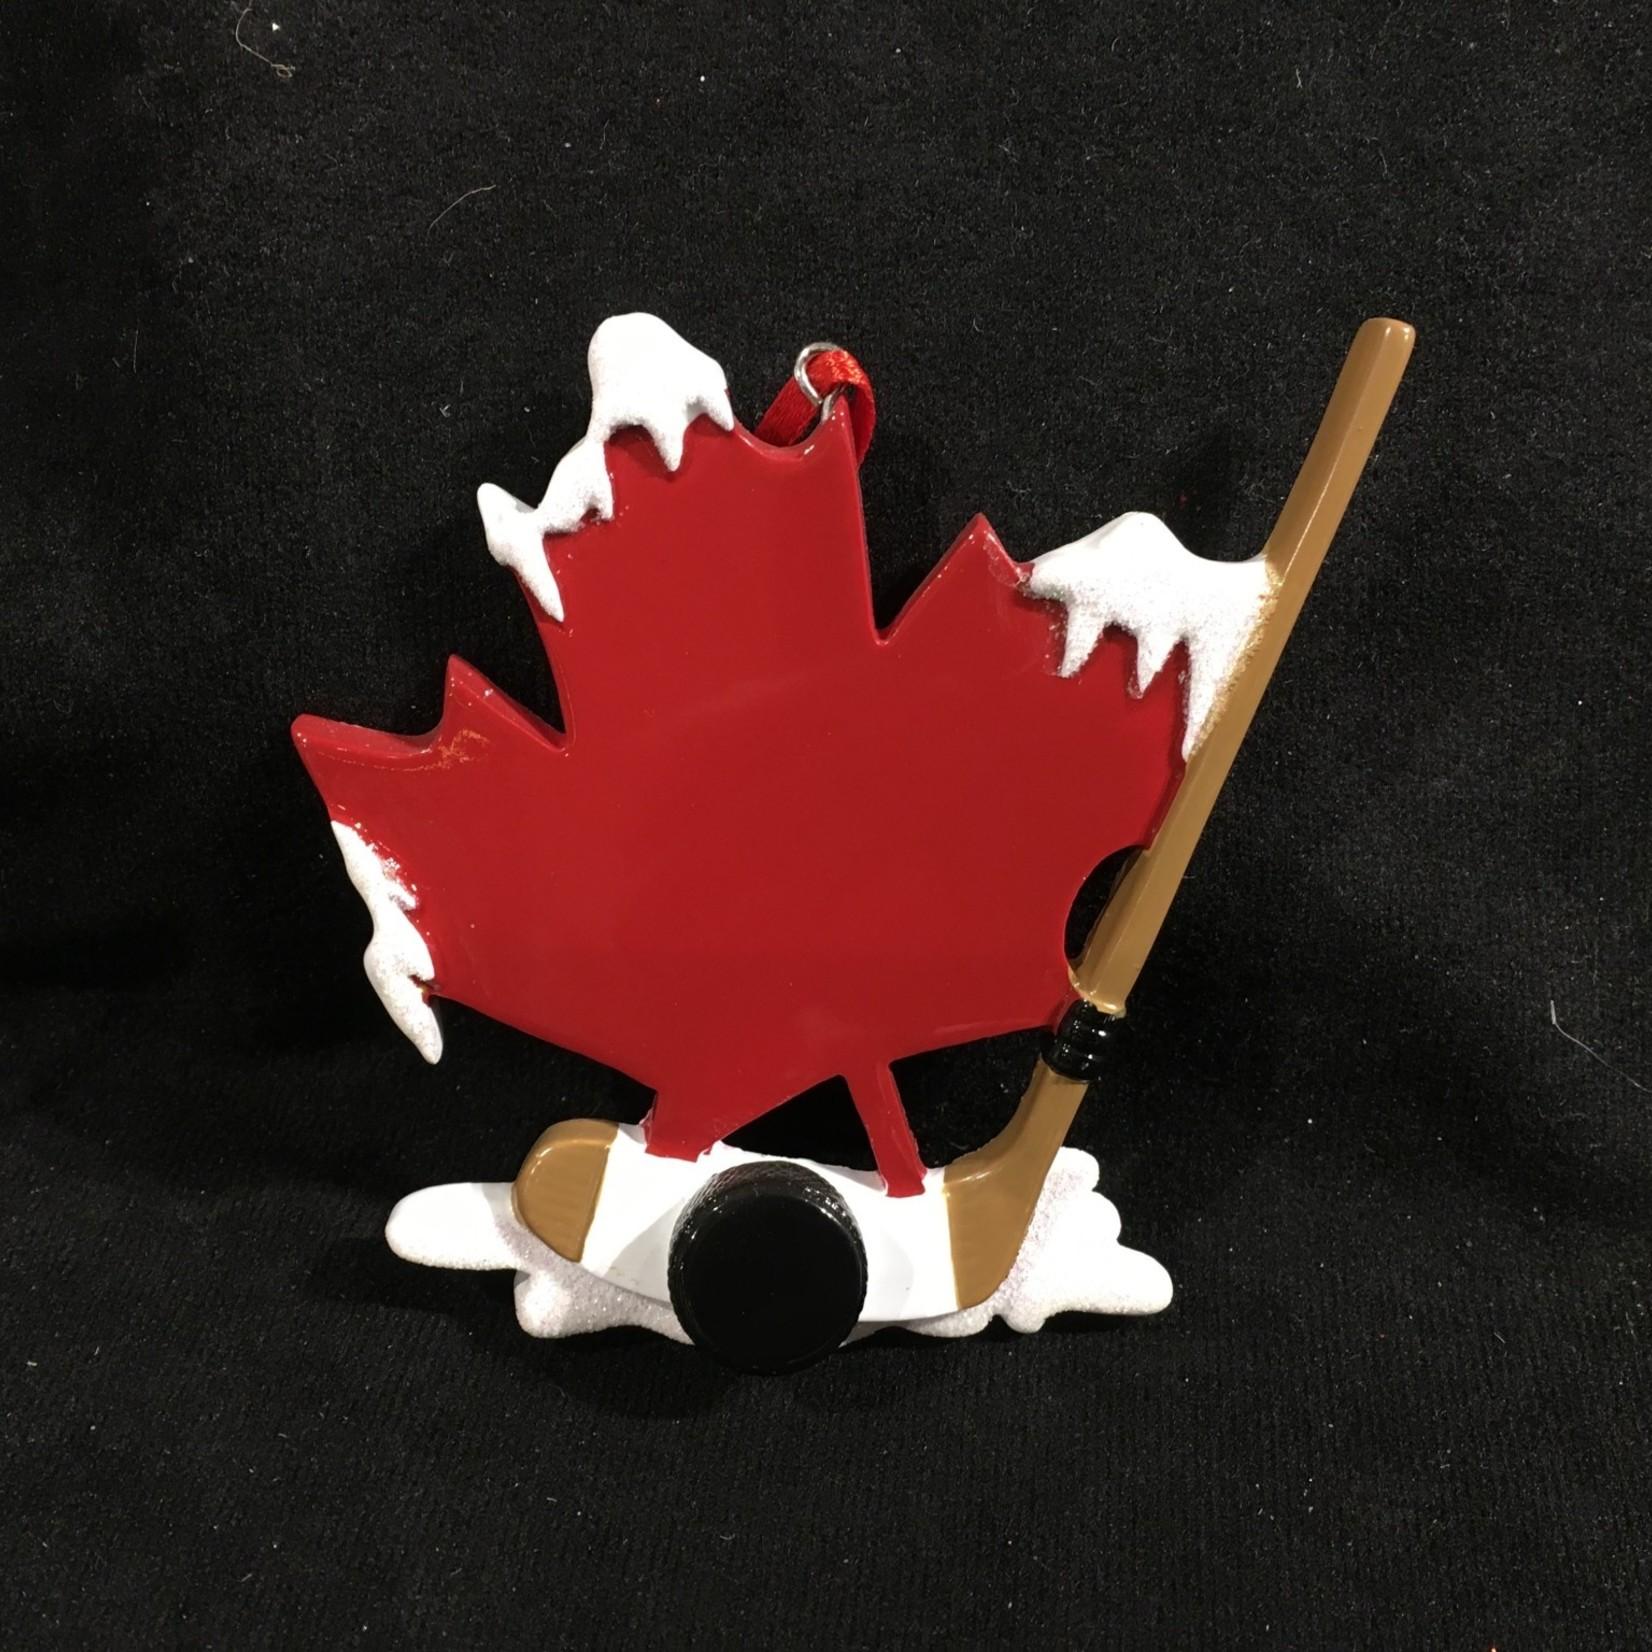 Canadian Hockey Orn